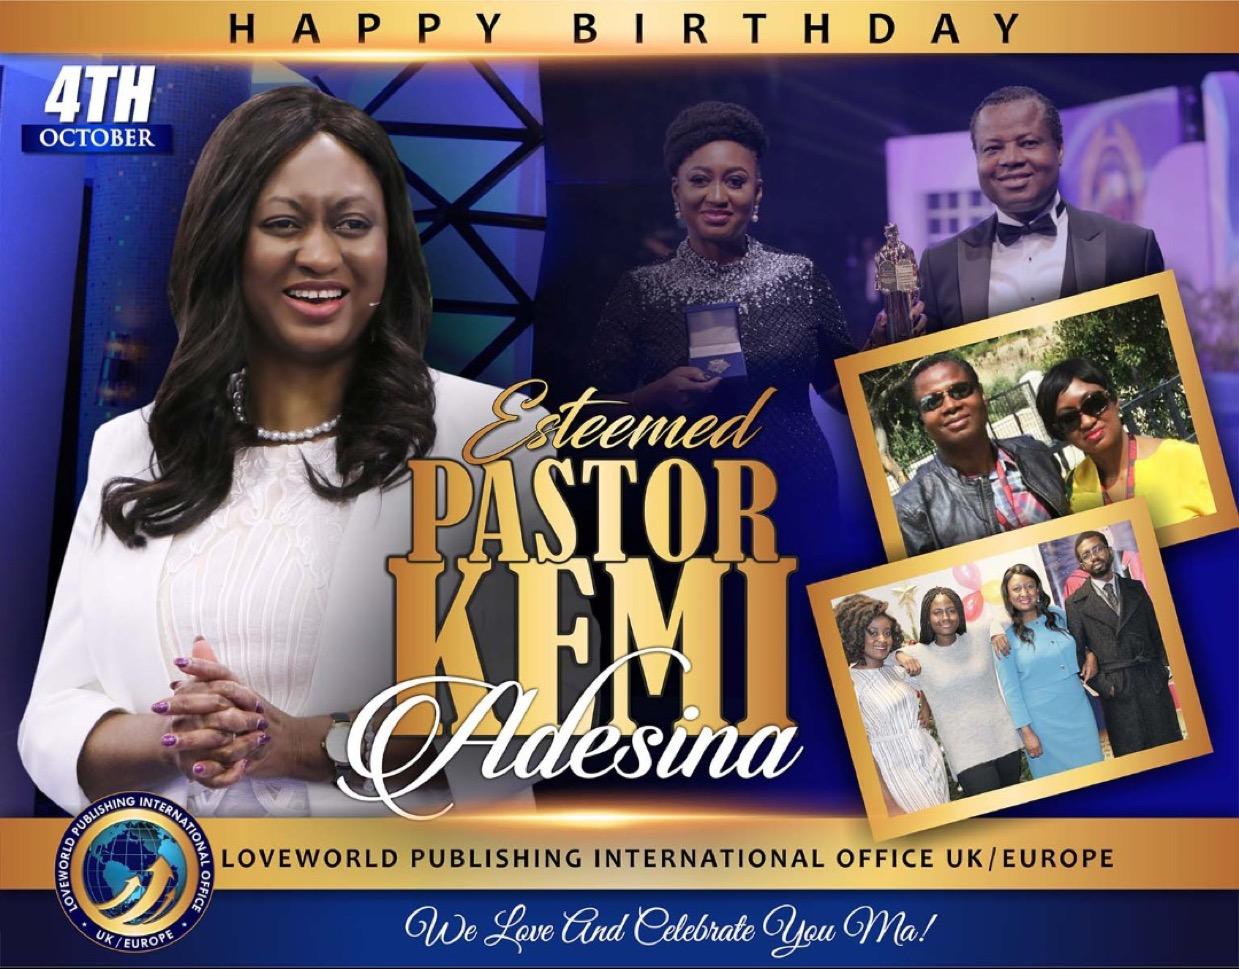 HBD 🥳 esteemed Pastor Kemi